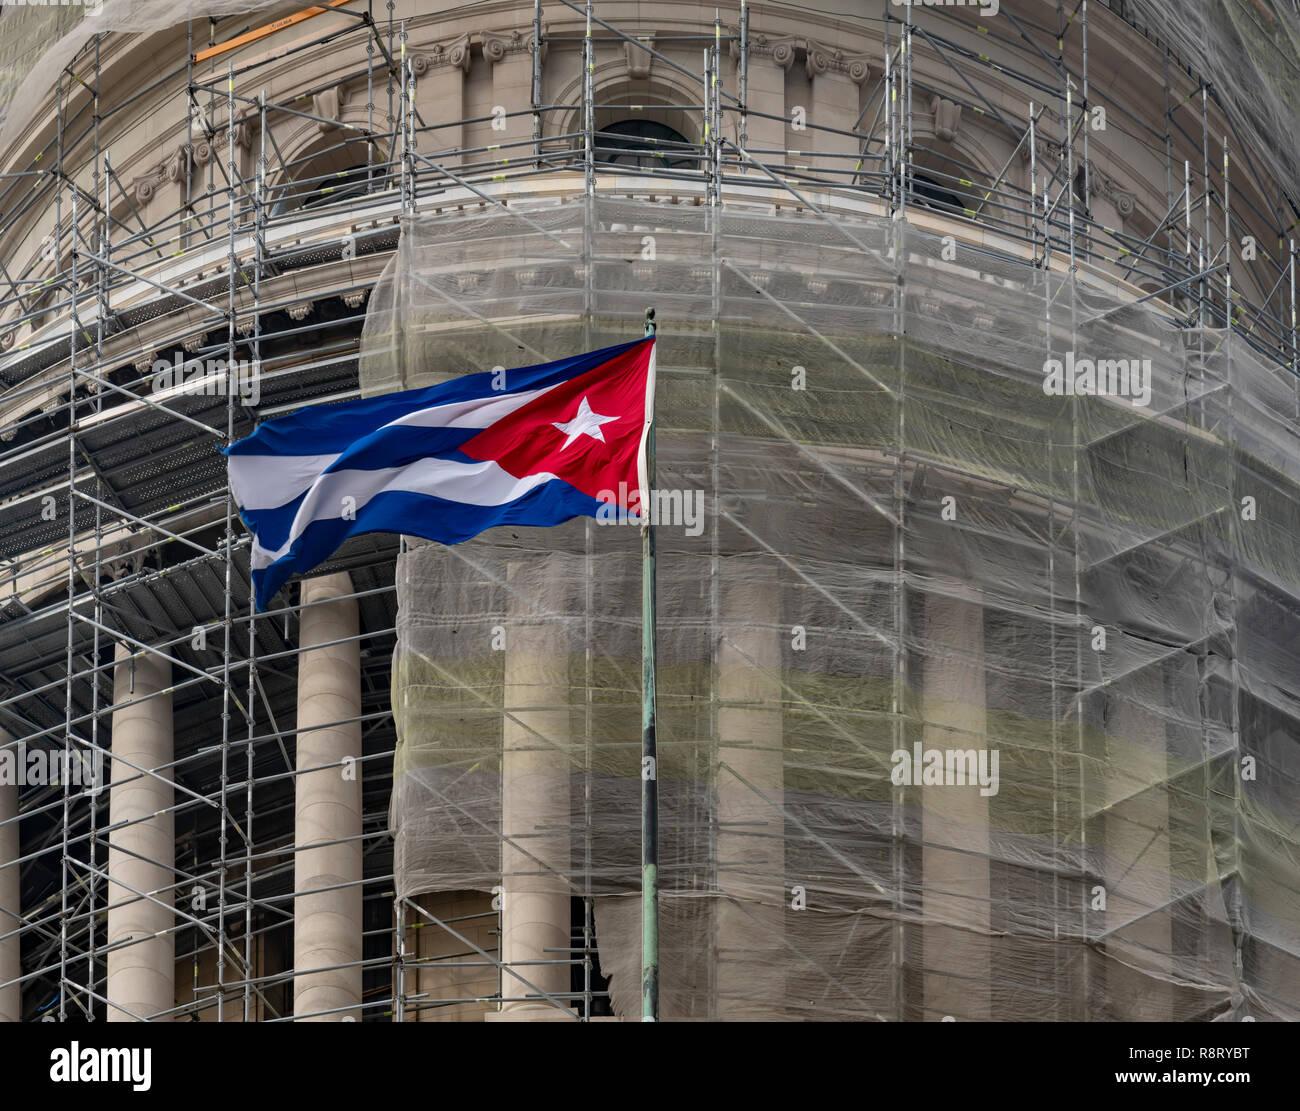 The El Capitolio building in Havana Cuba - Stock Image